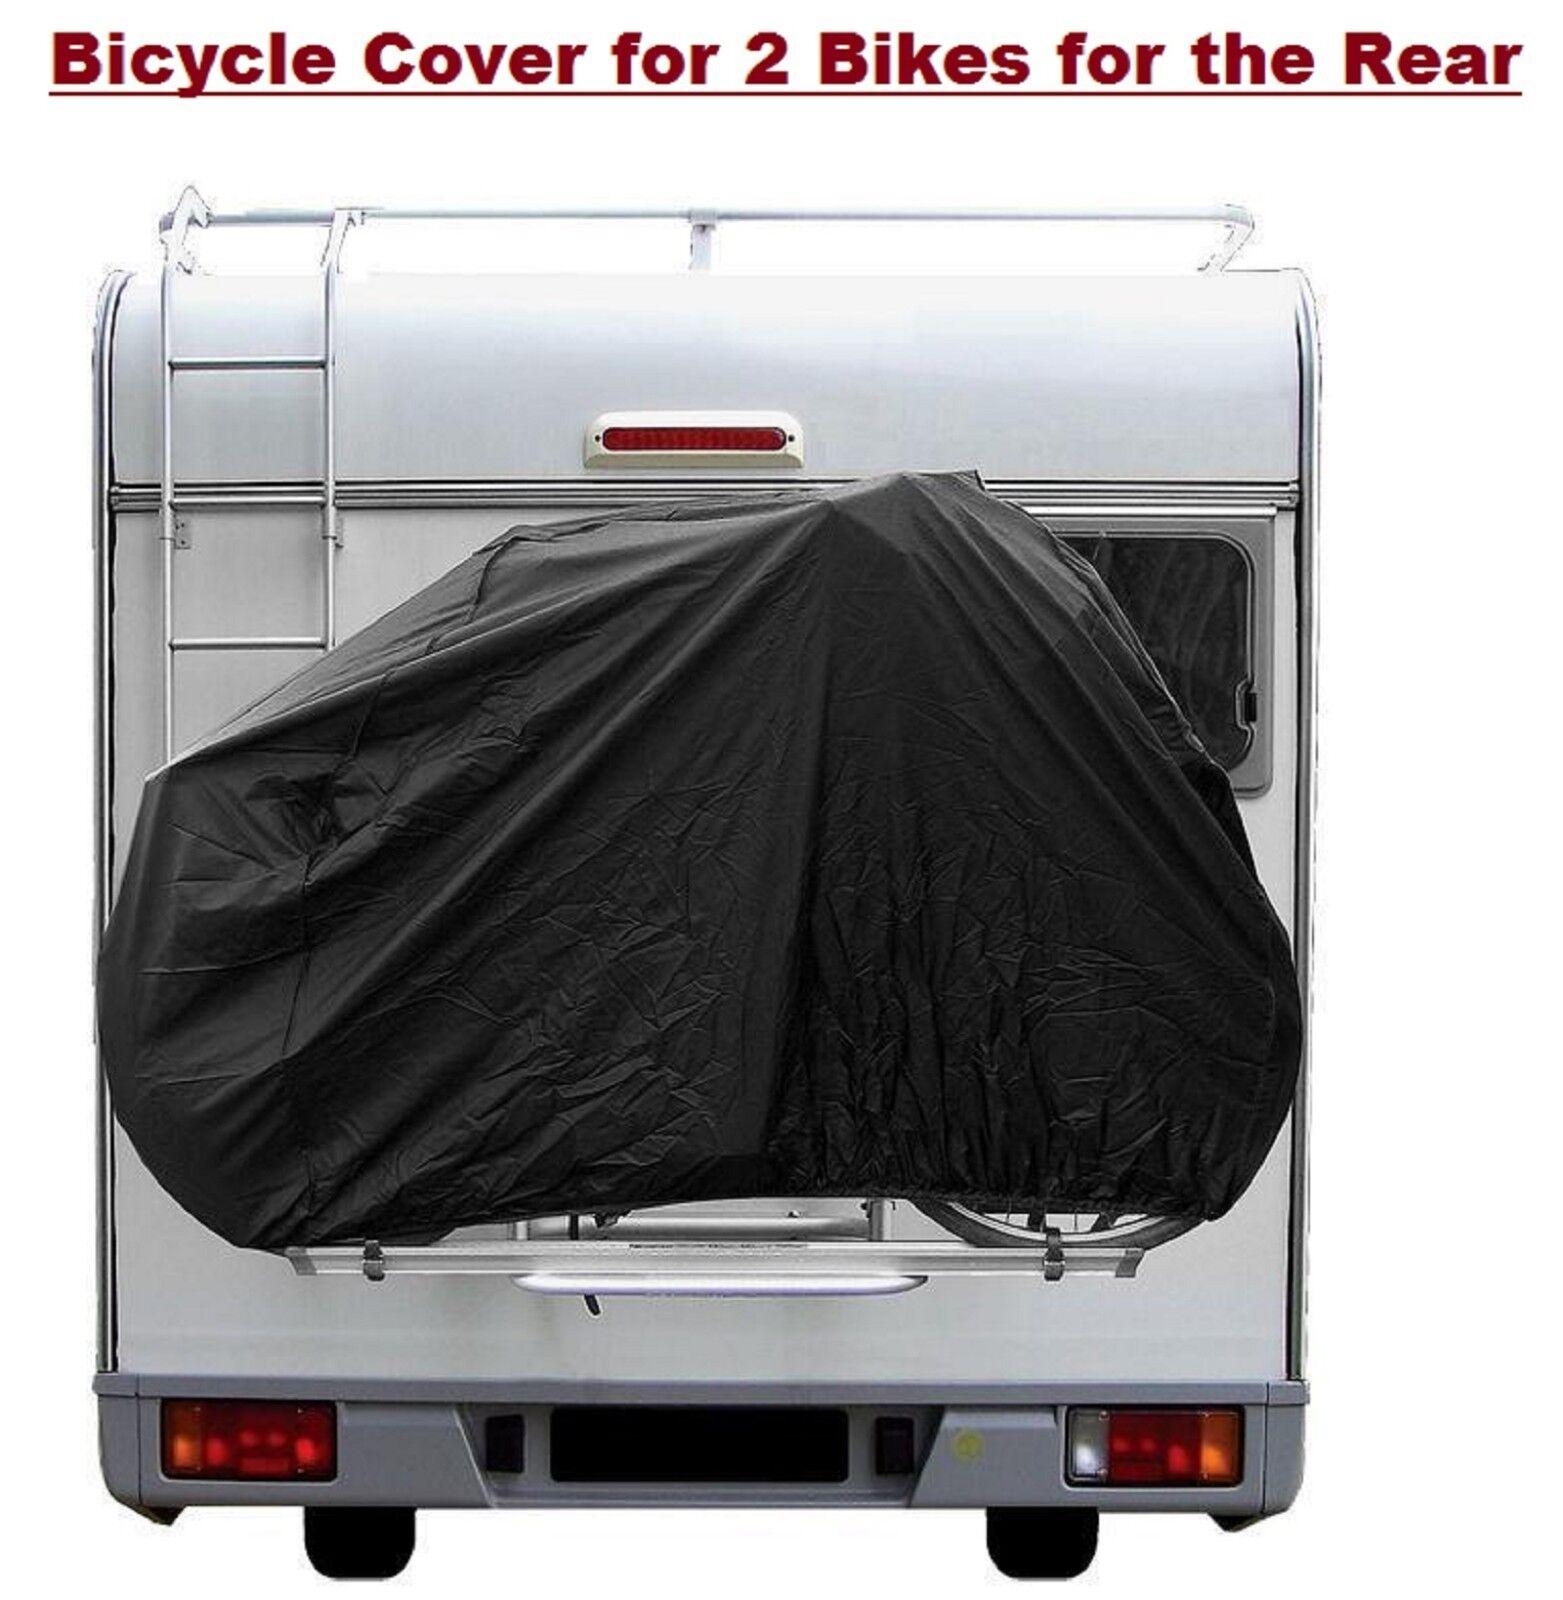 PROPLUS Bicycle Cover Caravan Camper Rear for 2 Bikes Waterproof Nylon Cover